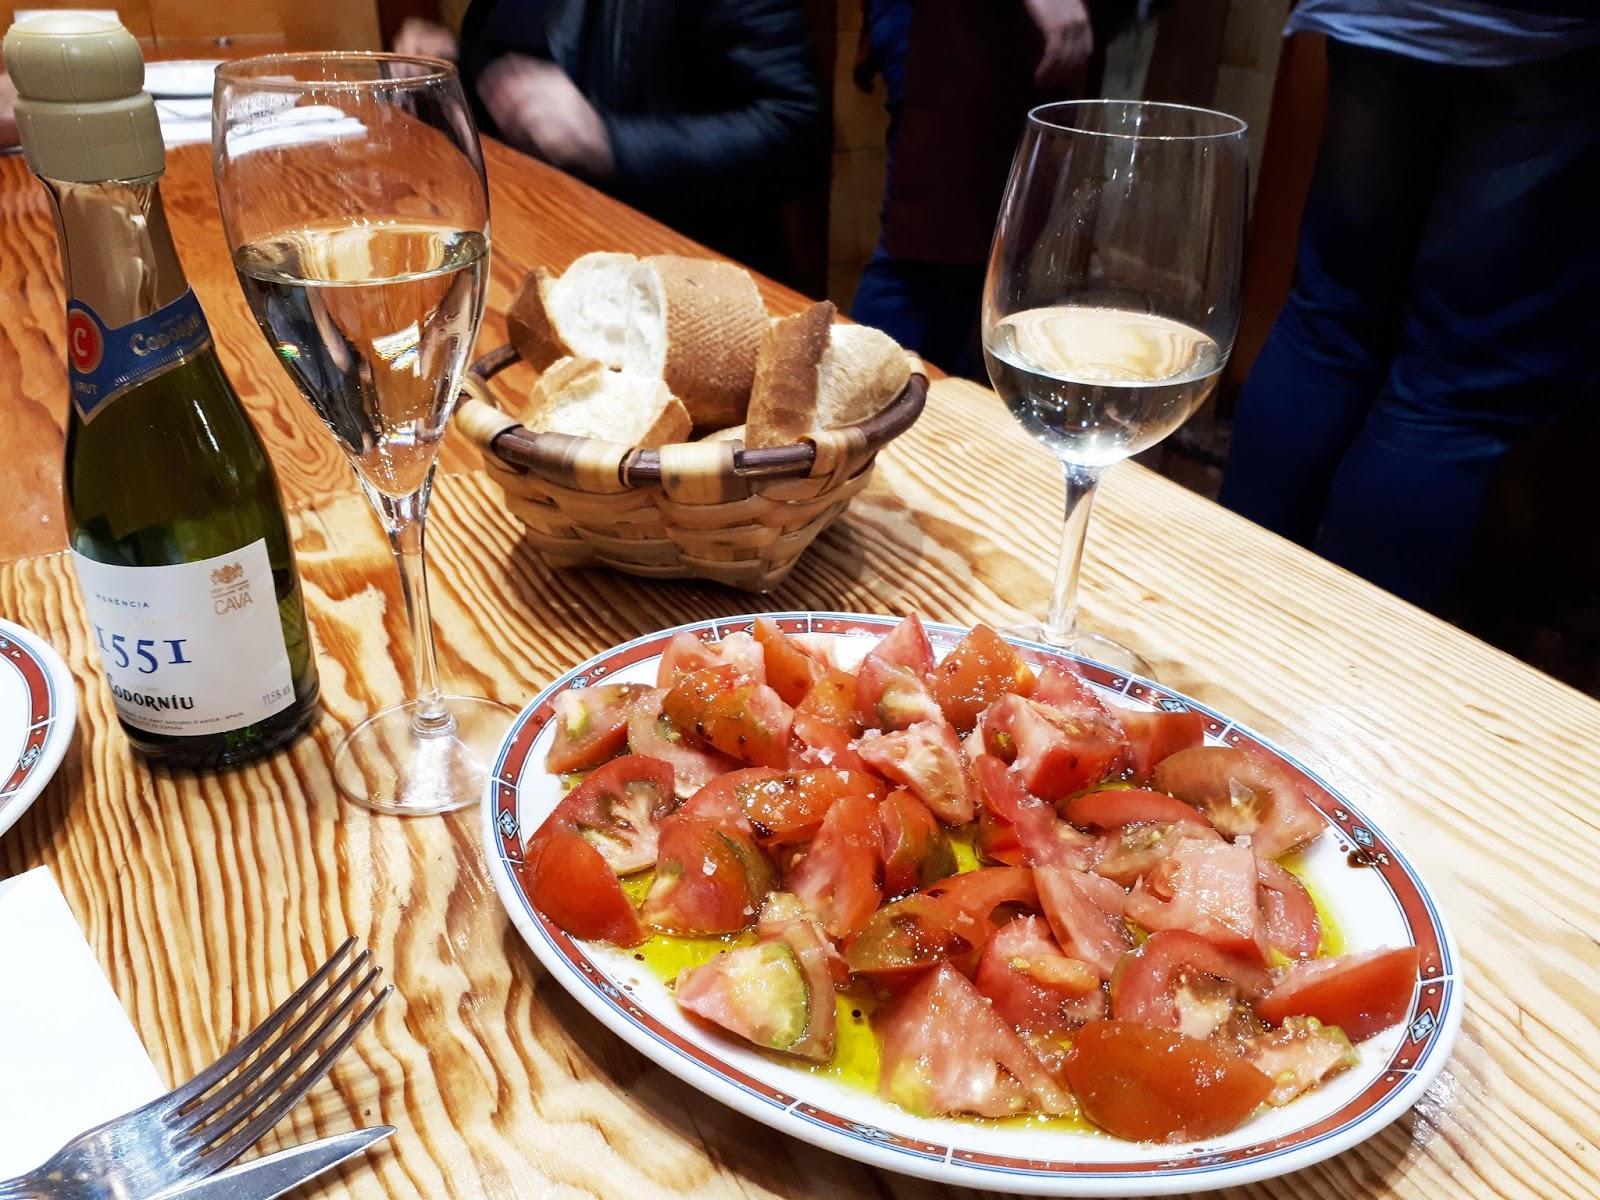 Meilleurs-pintxos-saint-sebastien-fuegonegro